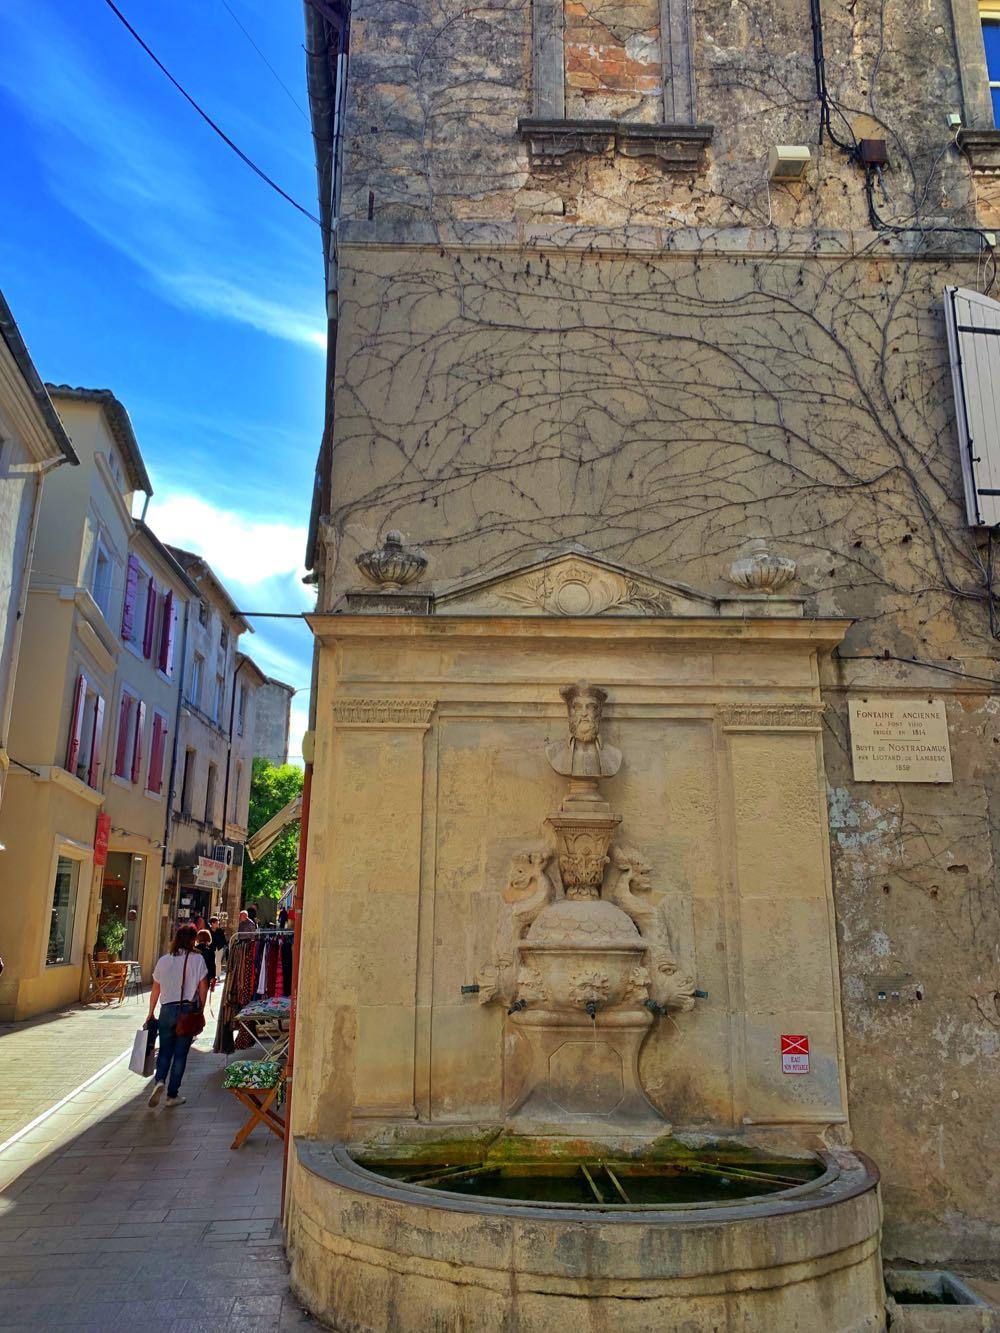 Fountain in Saint-Remy-de-Provence